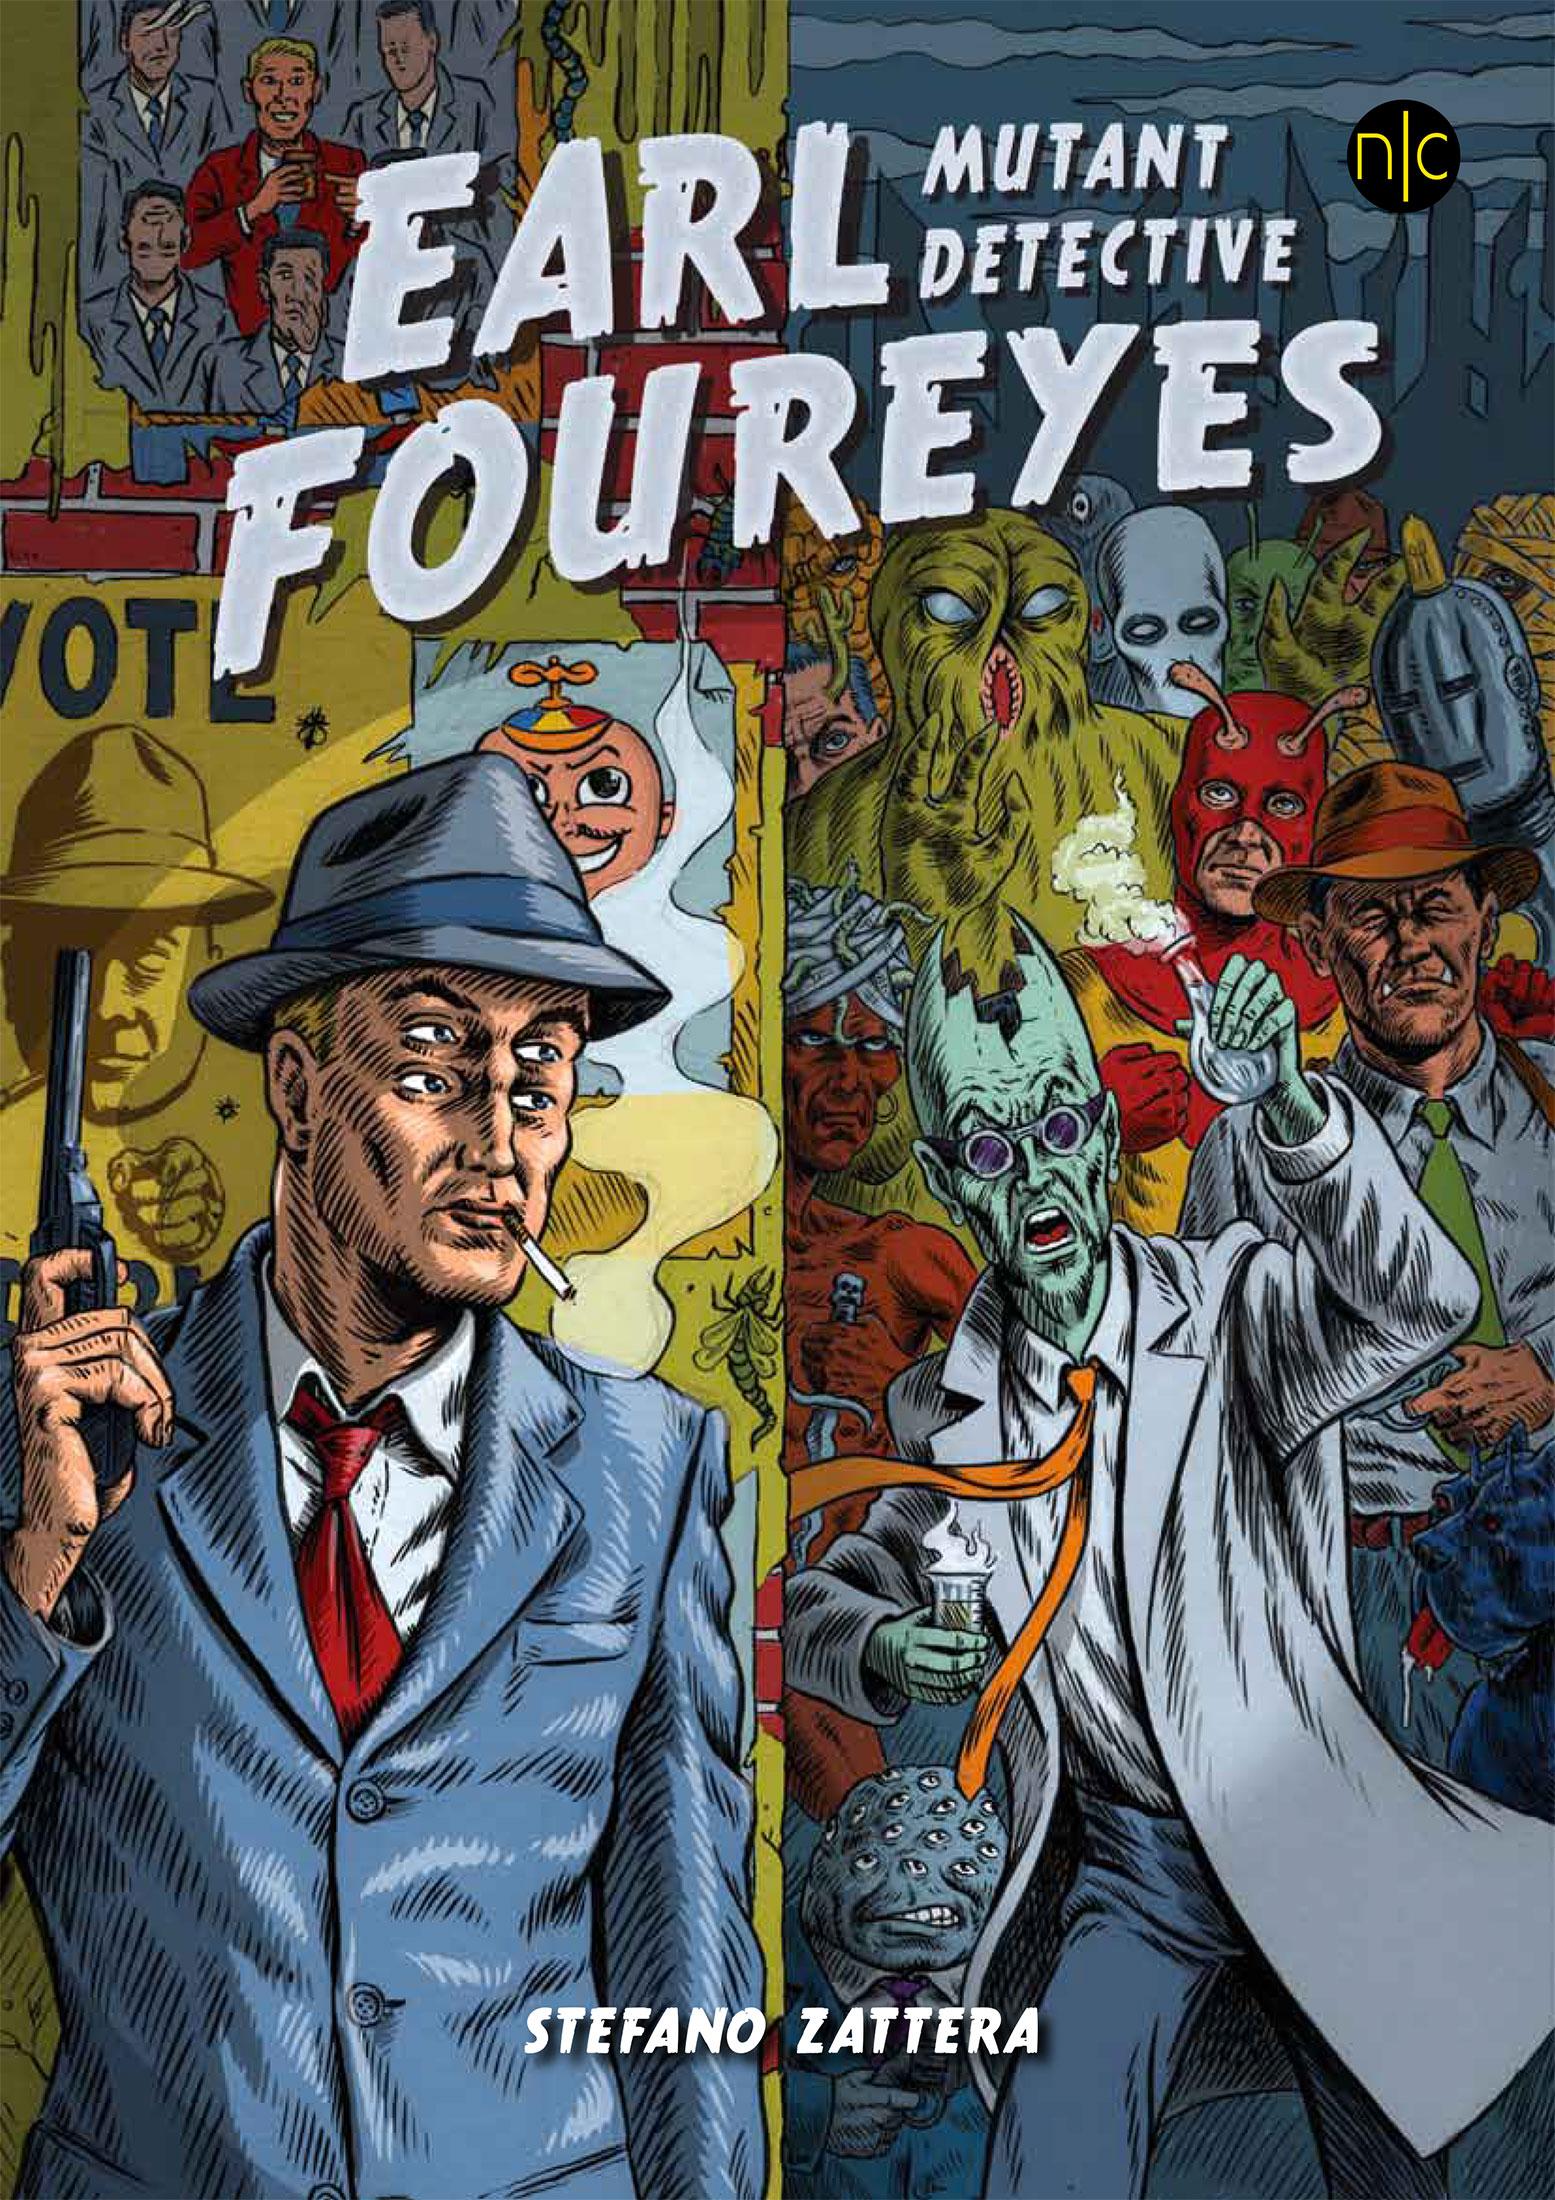 Earl Foureyes